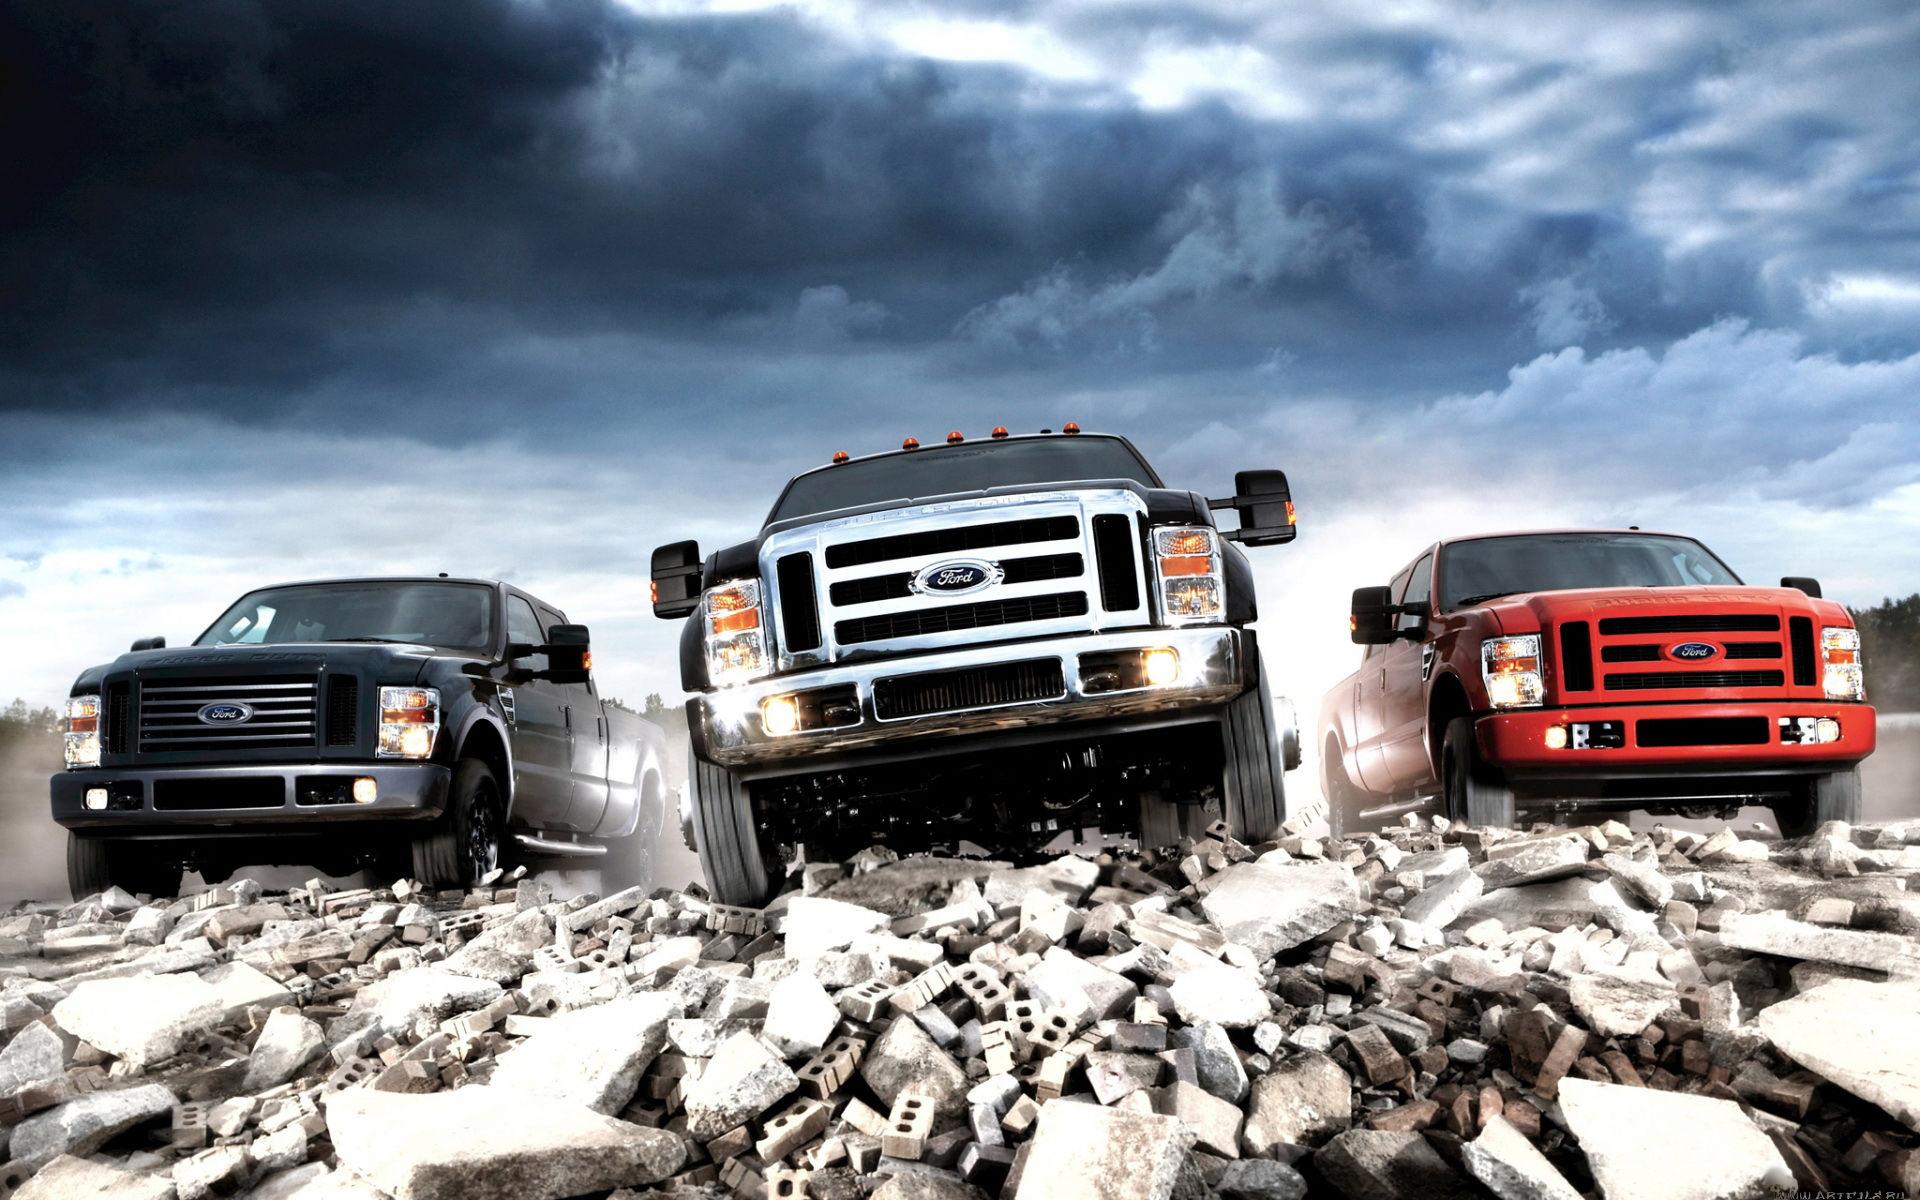 Autos Camiones Fondos De Pantalla Gratis: Camionetas Ford Fondo De Escritorio 1920x1200